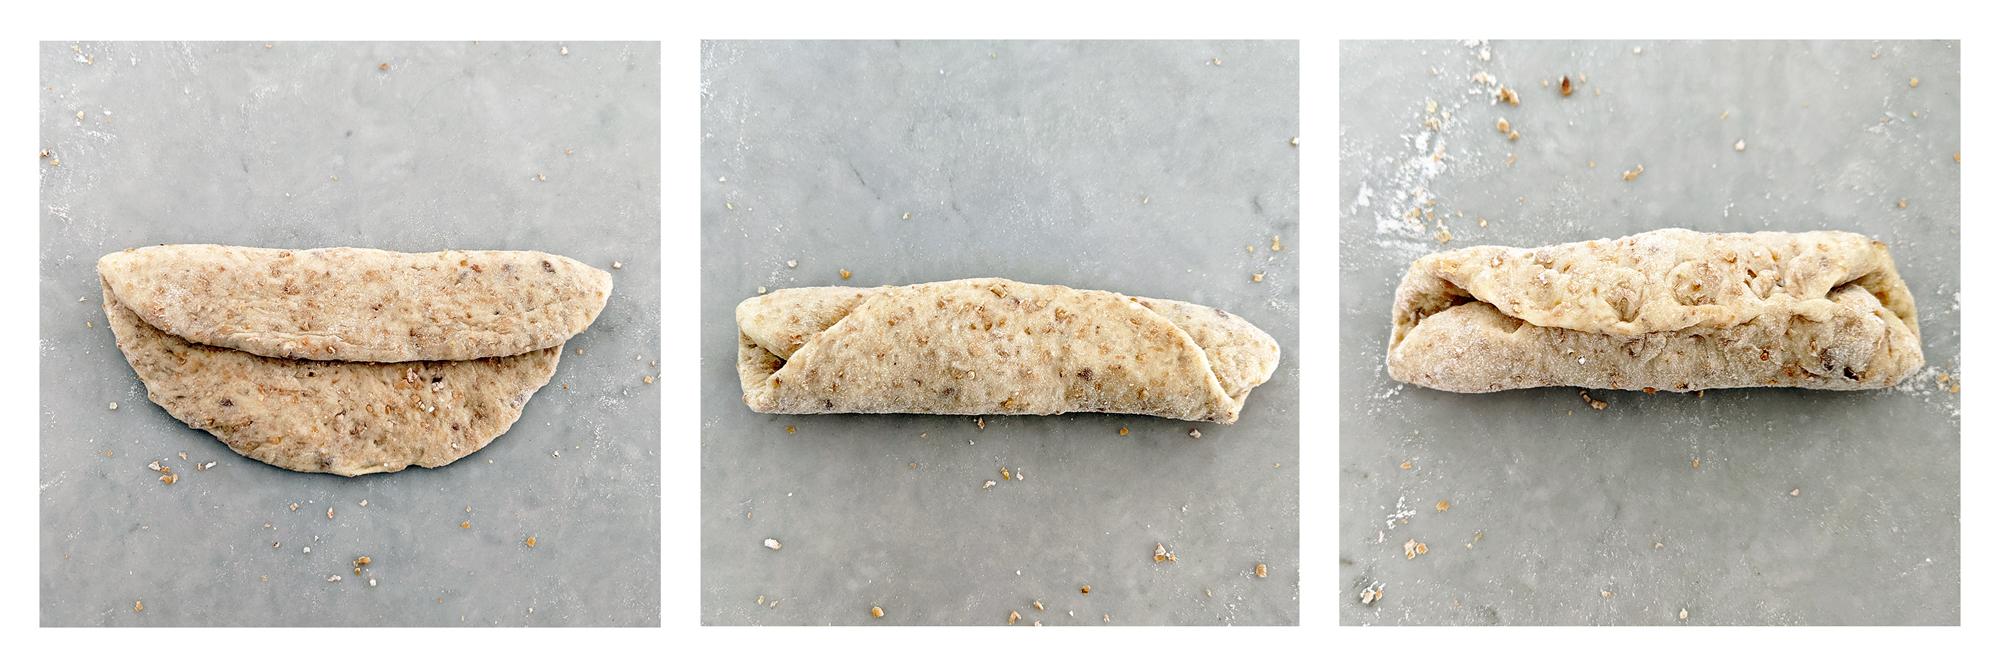 Hokkaido milk bread dough ready to rise